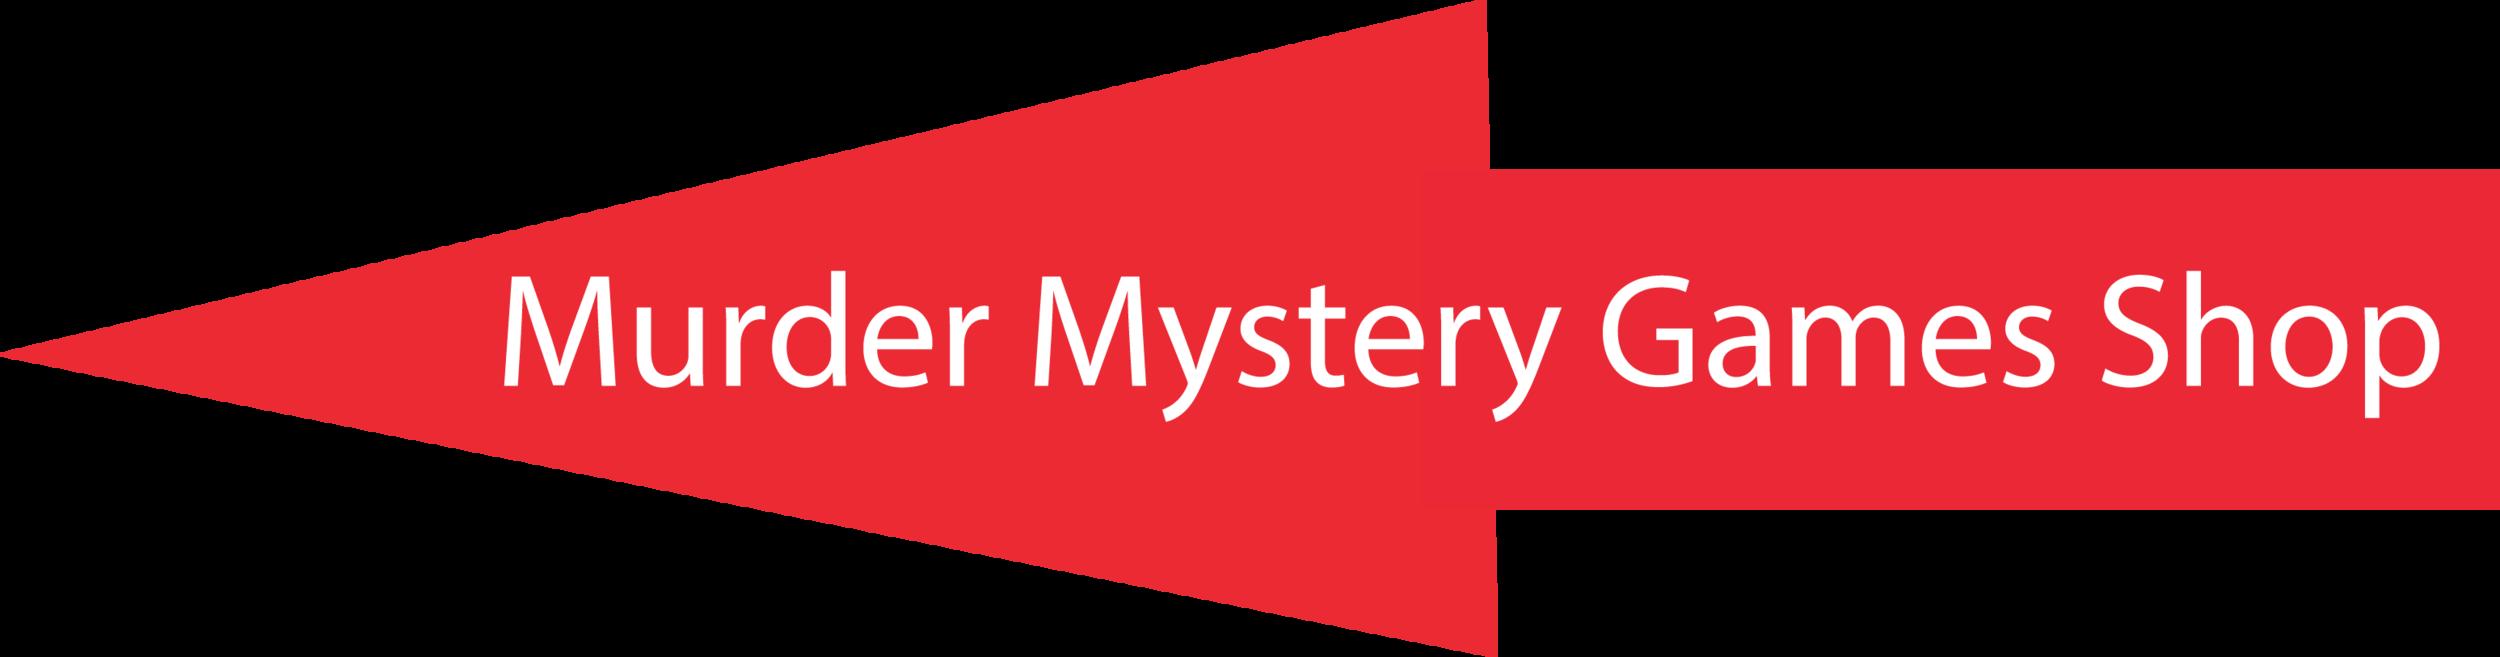 Arrow to Murder Mystery Games Shop on Murder Mystery Games website